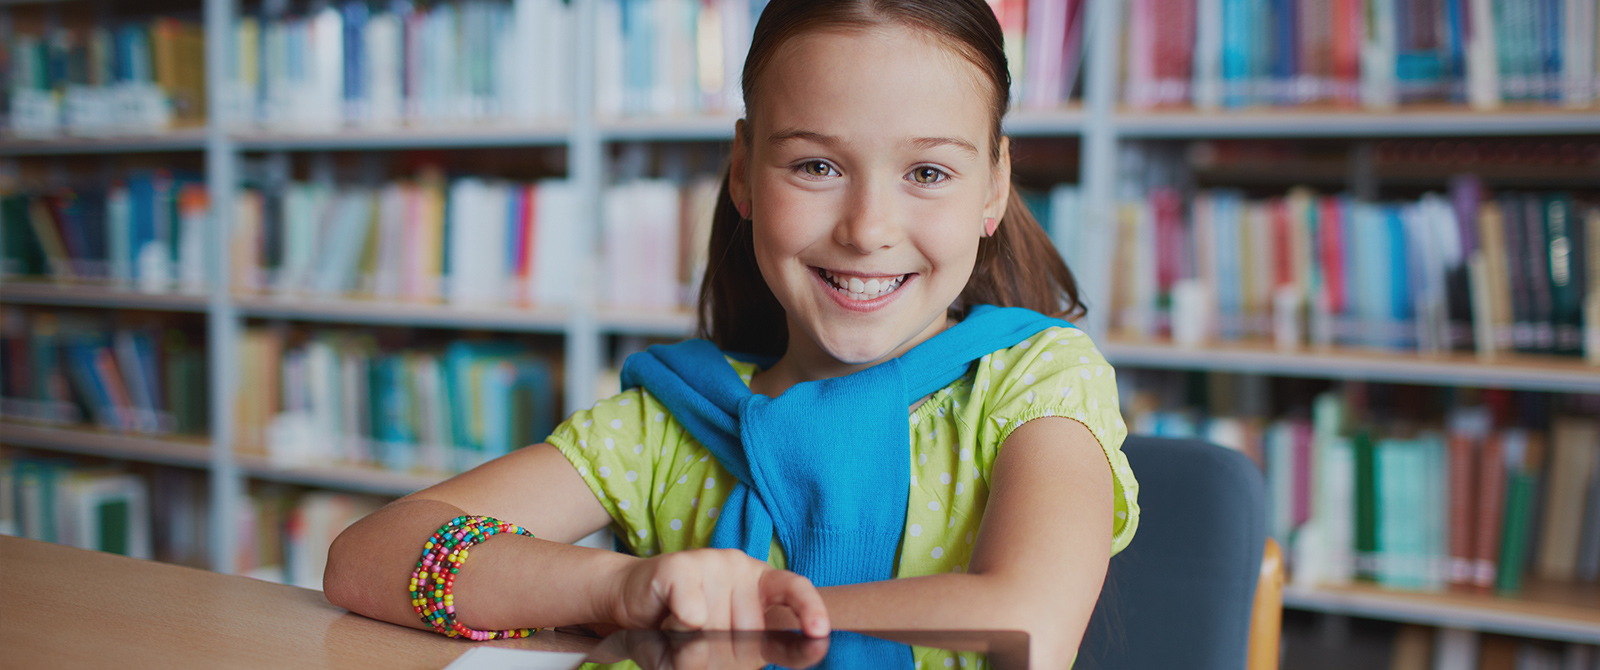 Putting Children First. Preparing Children For Success In Life